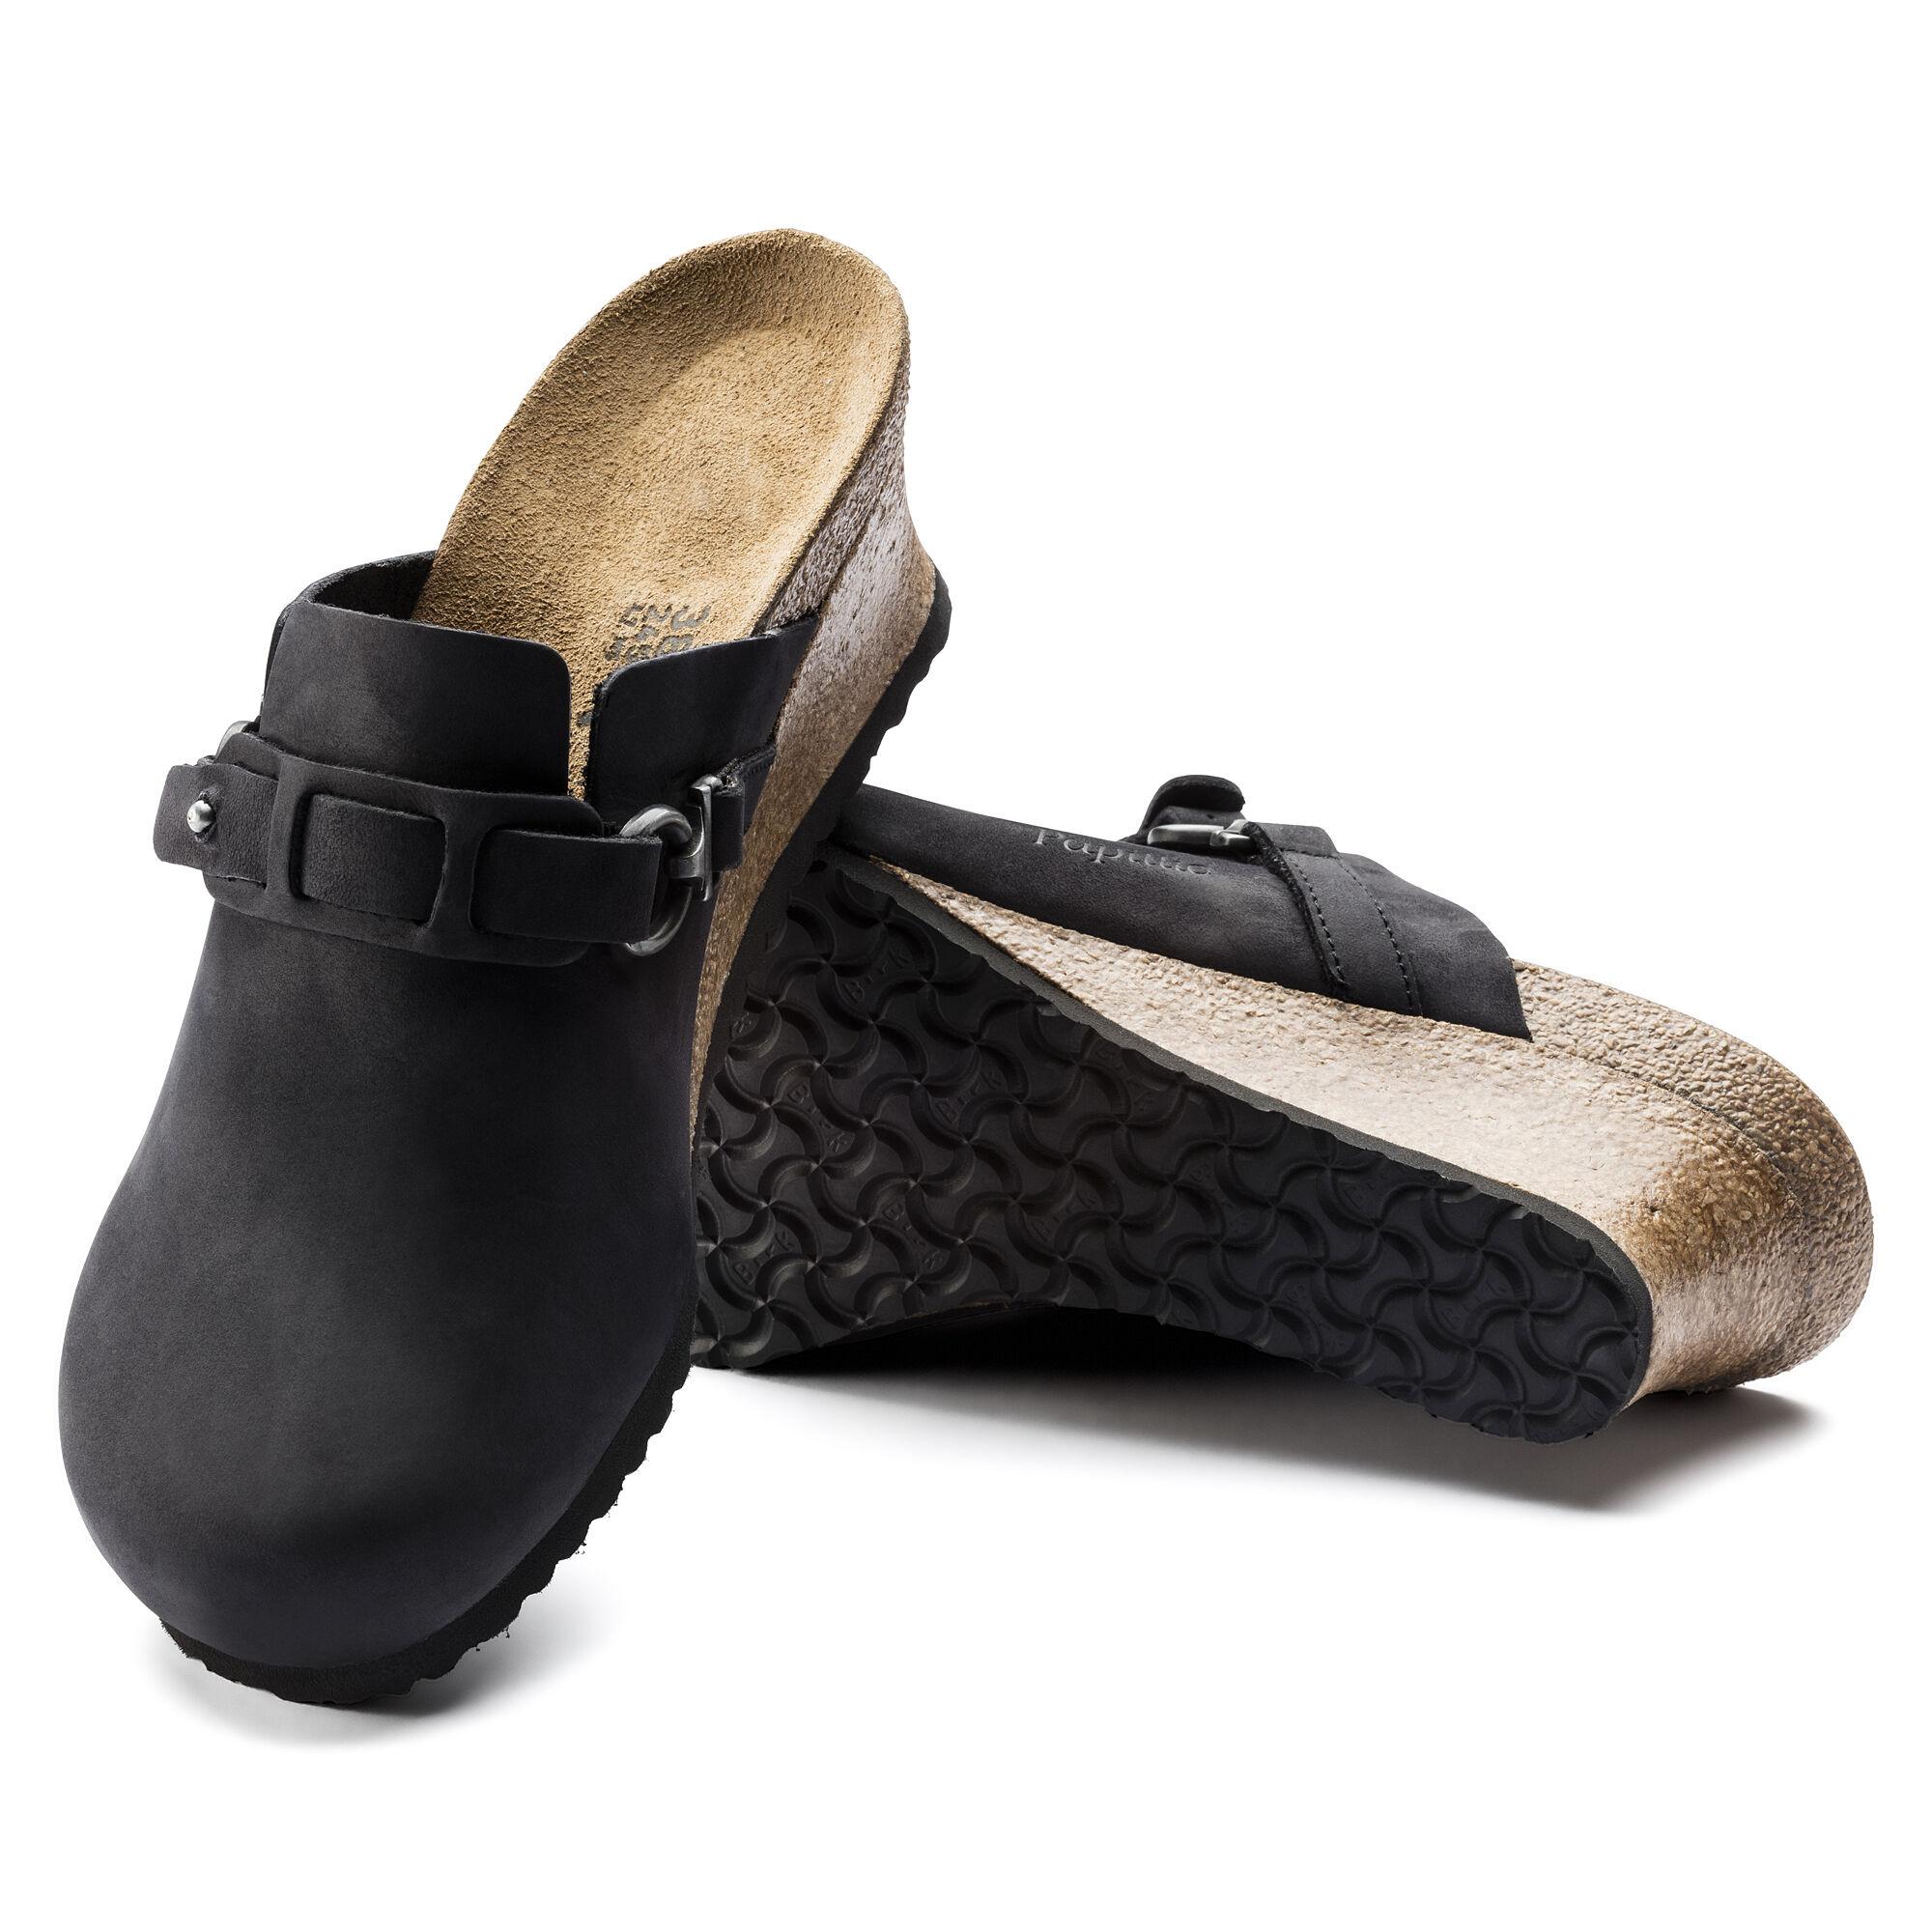 Dana Oiled Leather Black